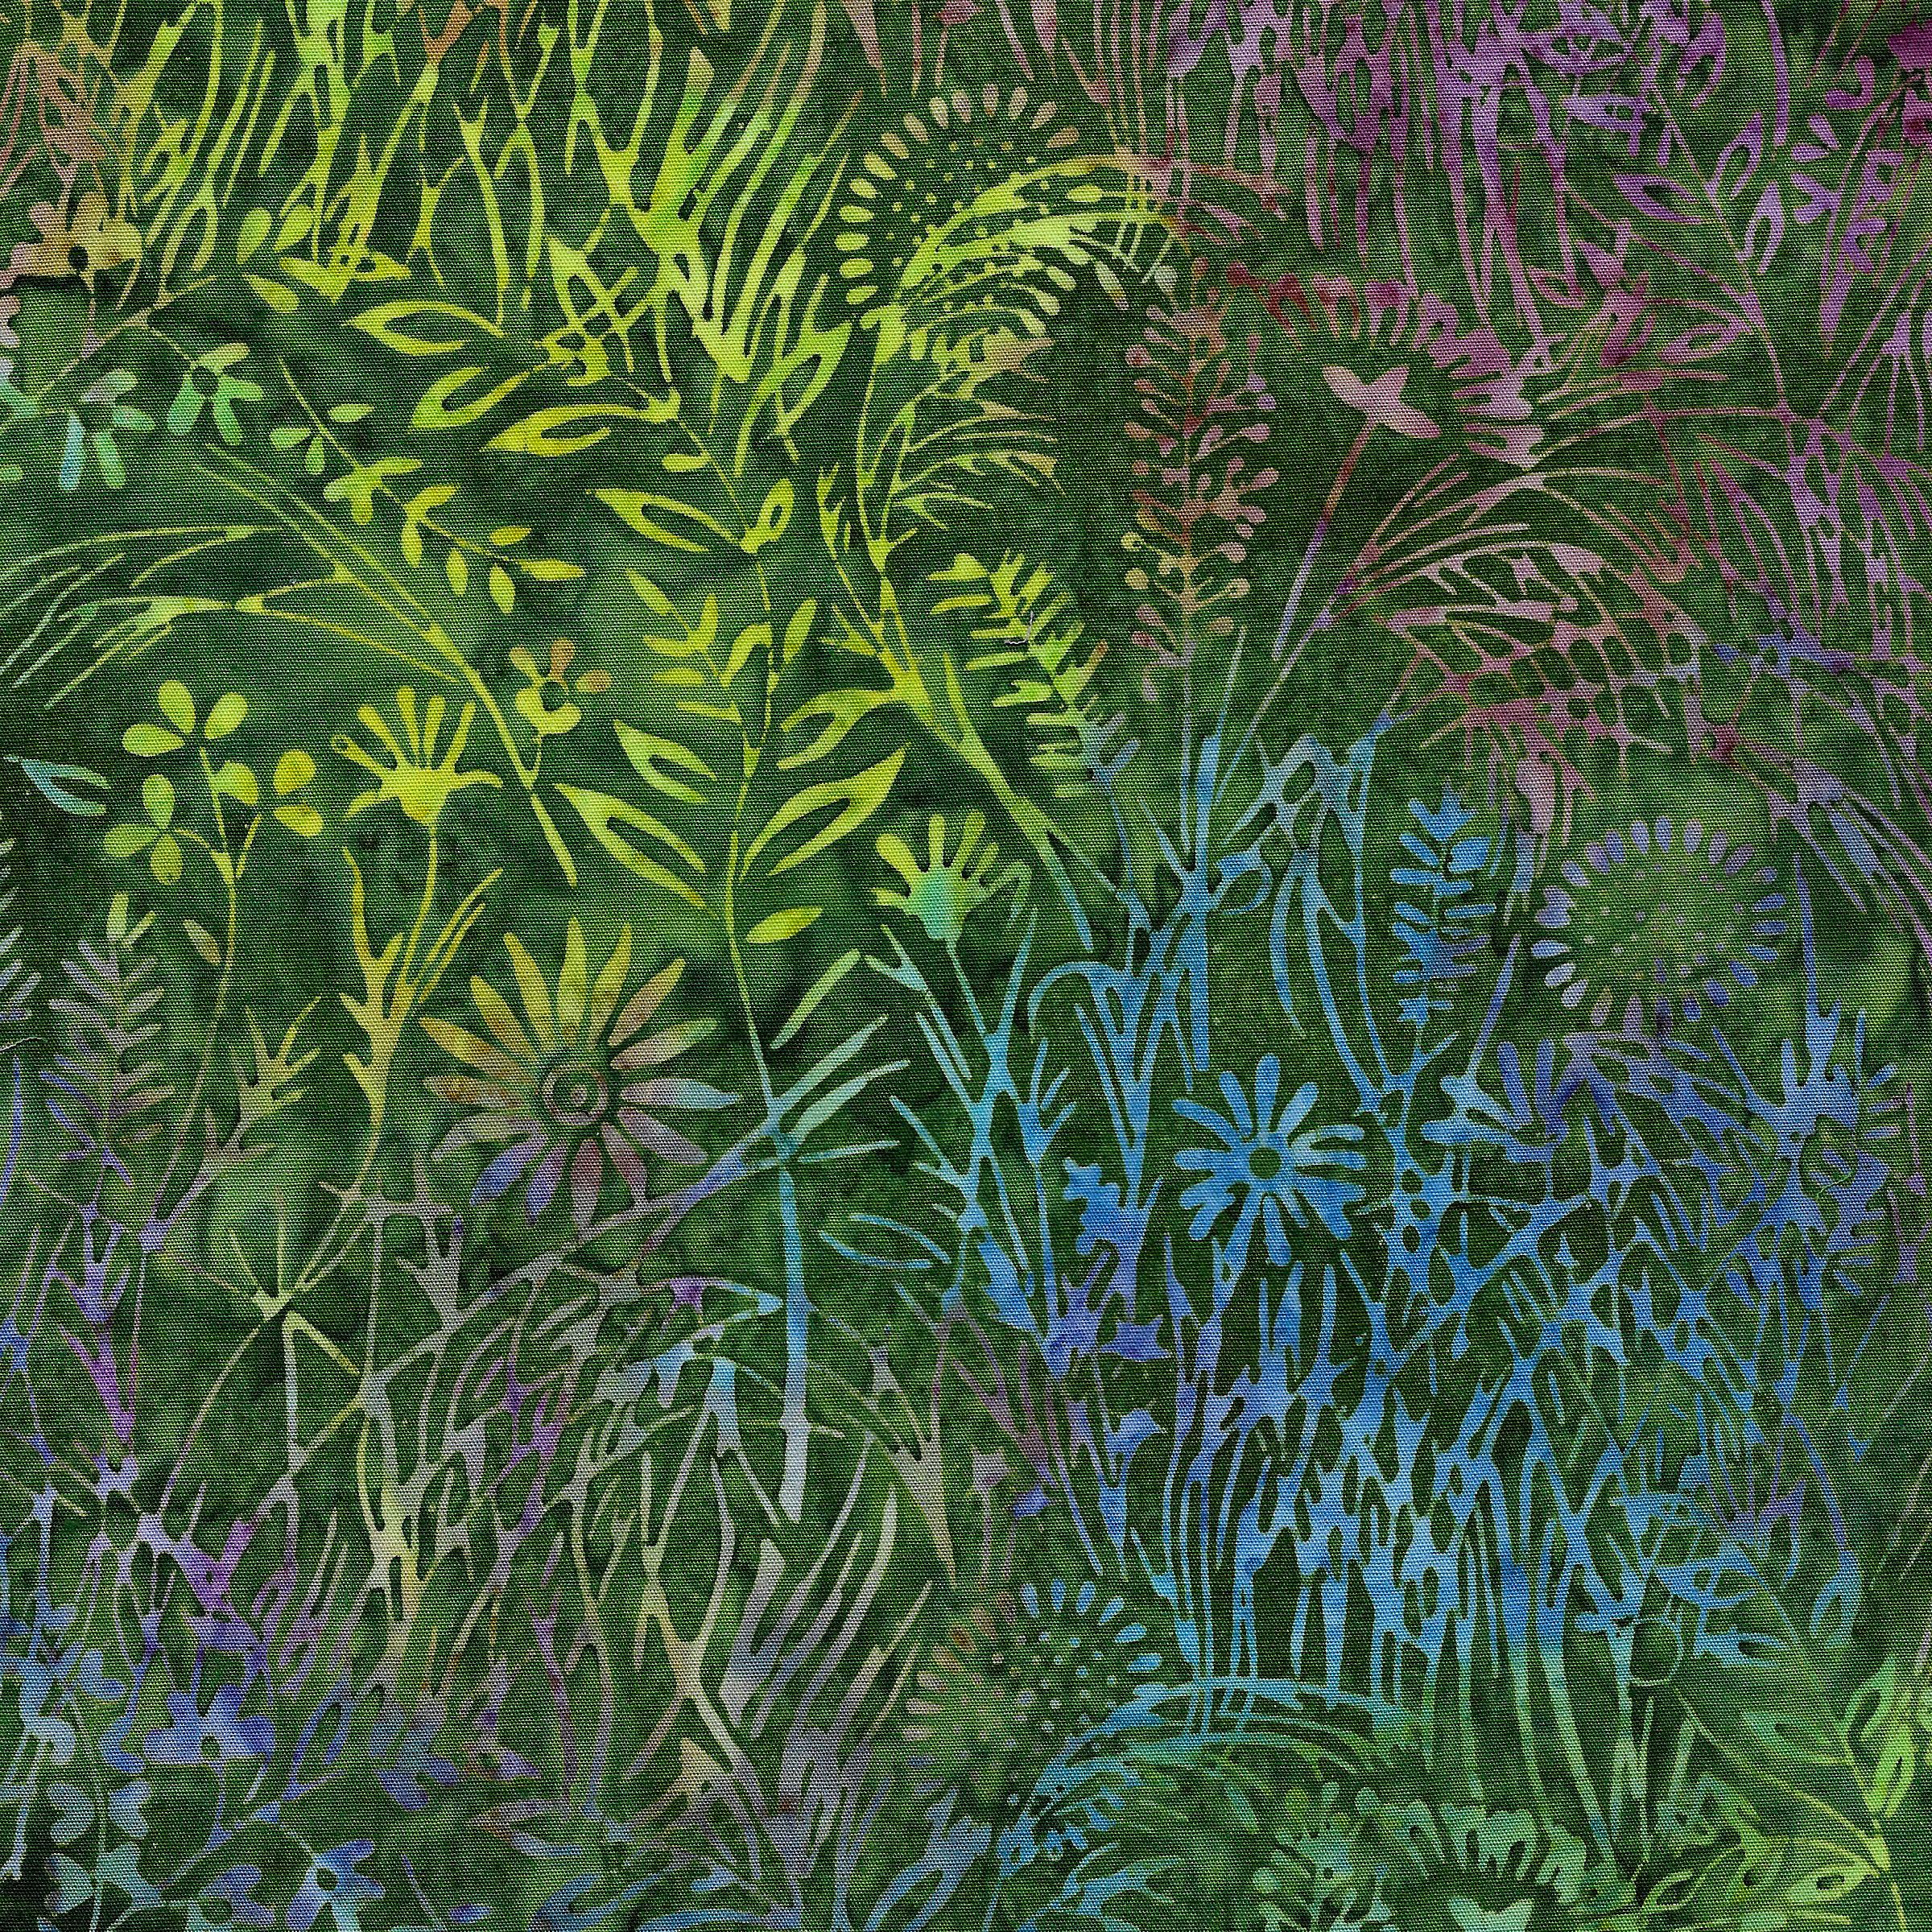 111931883 / Wildflower-Mardigras